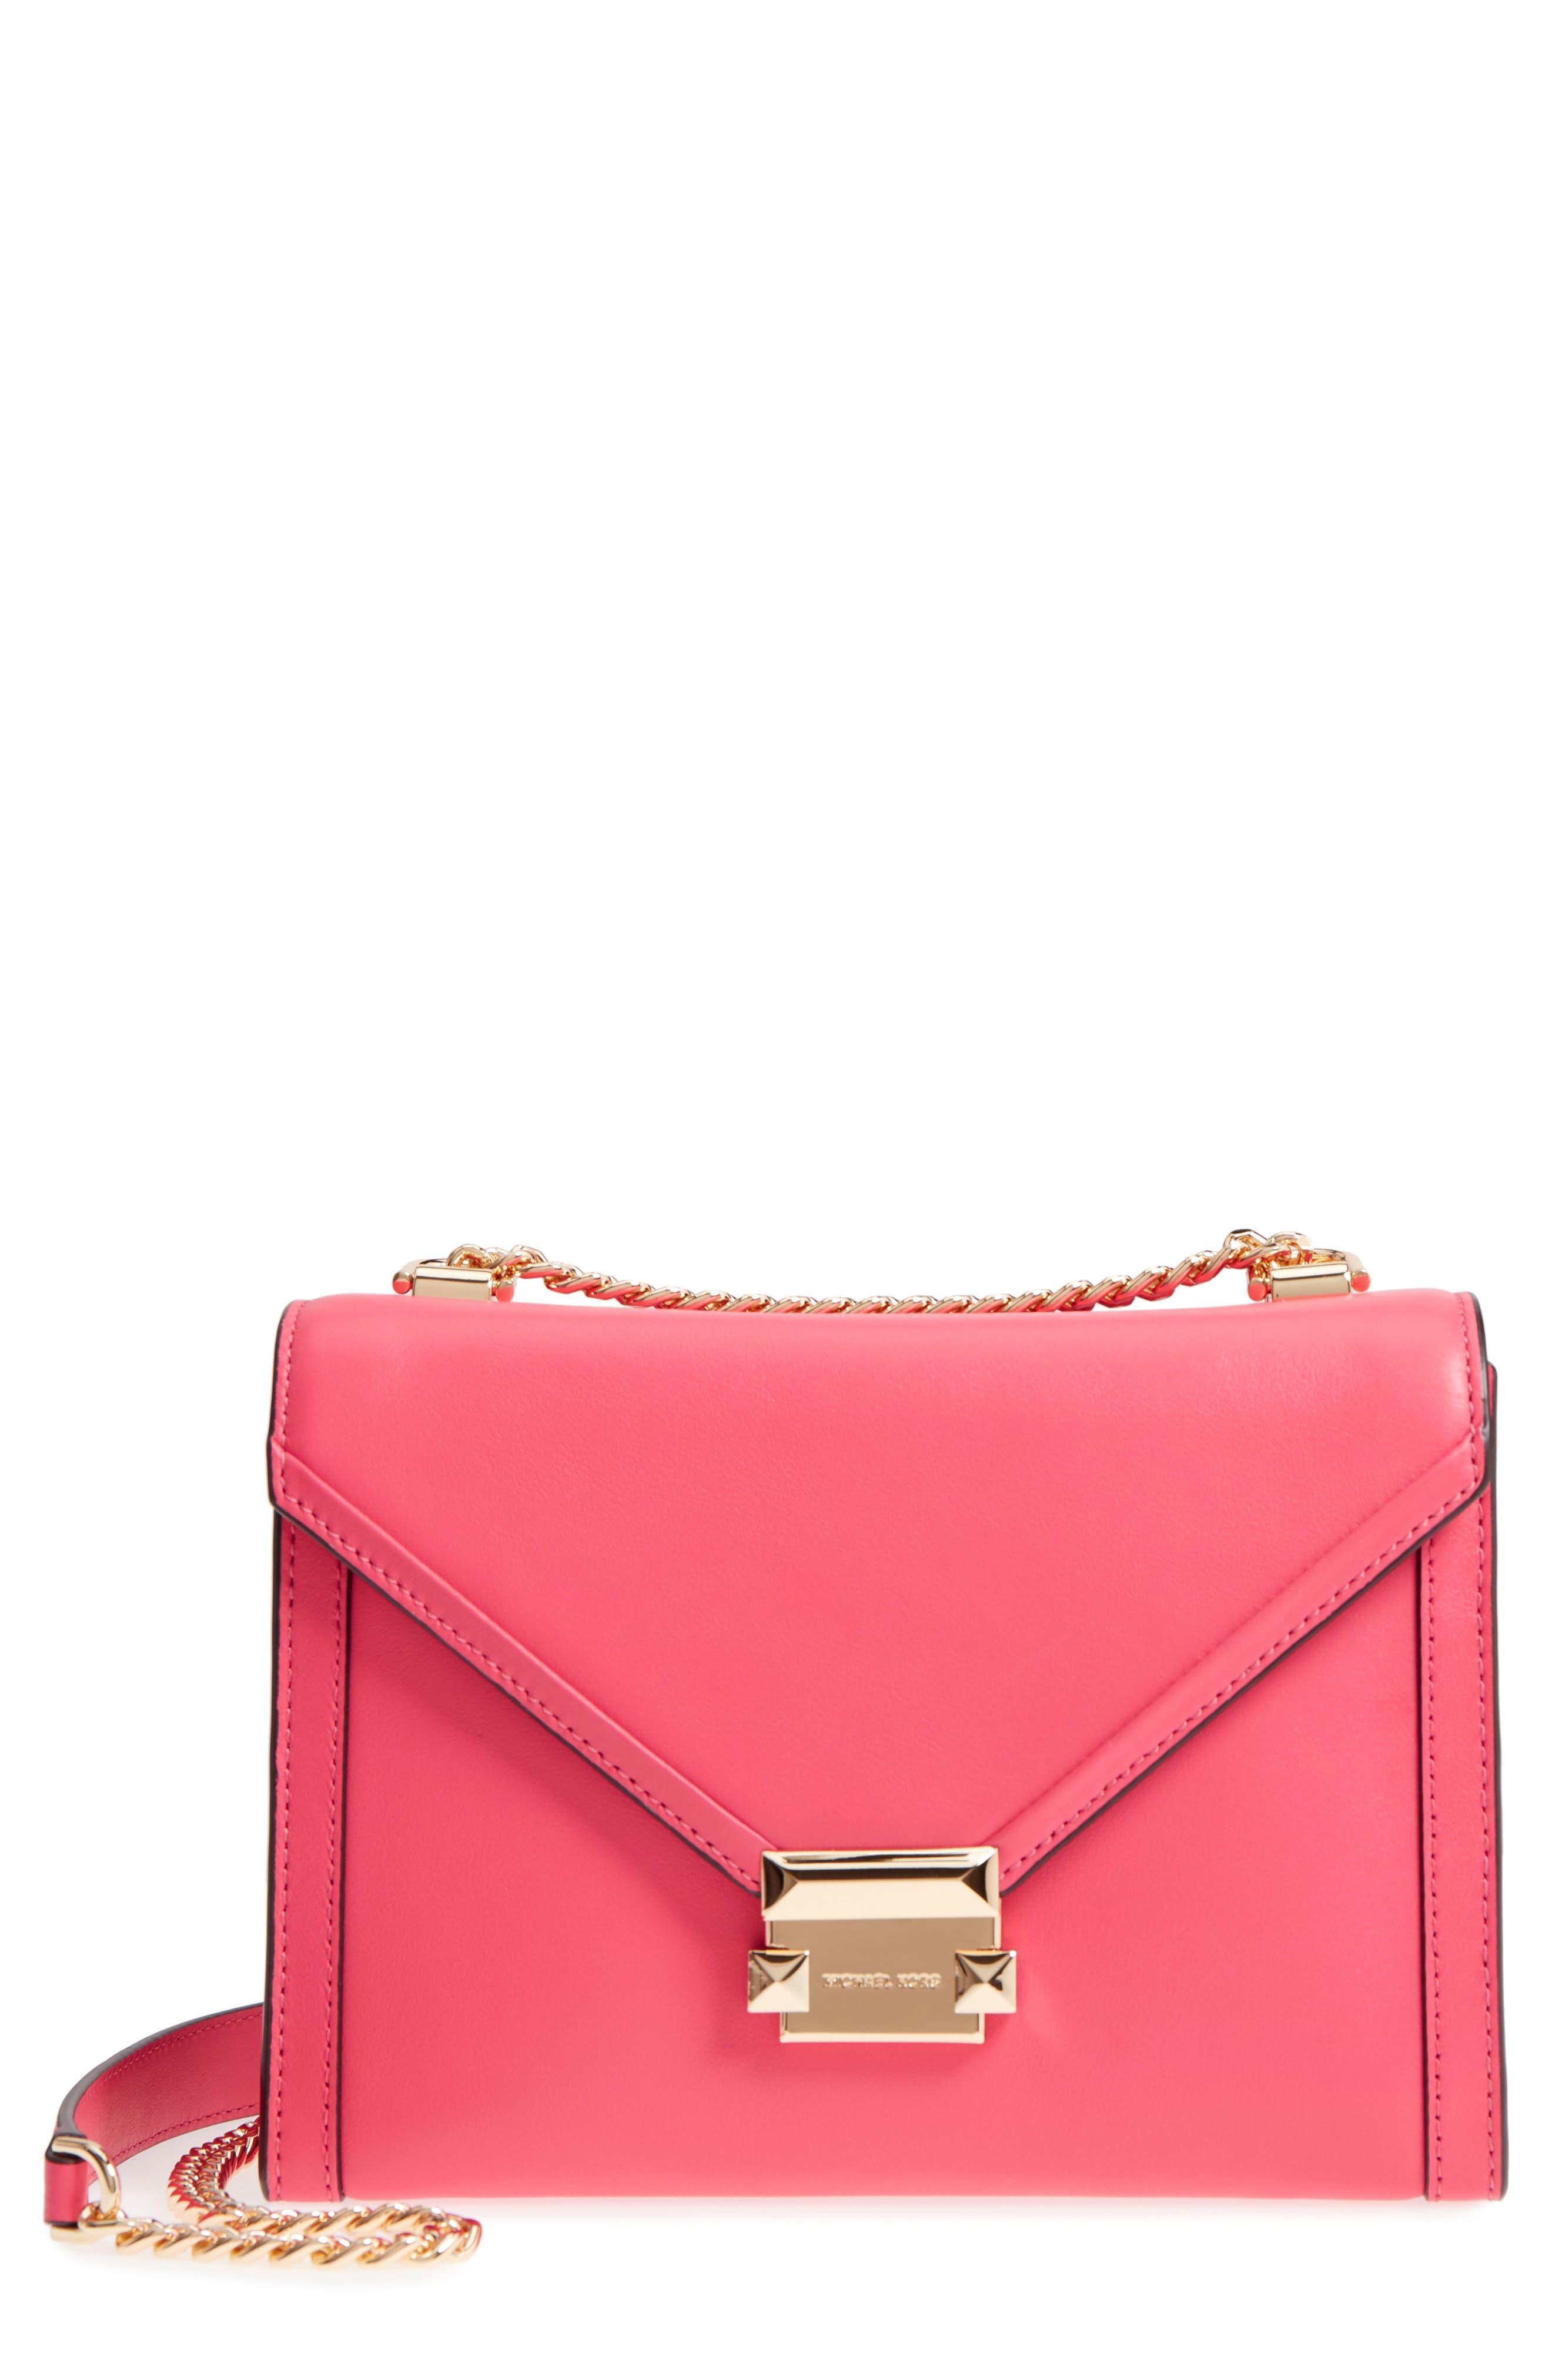 Large Whitney Leather Shoulder Bag,                             Main thumbnail 1, color,                             Rose Pink